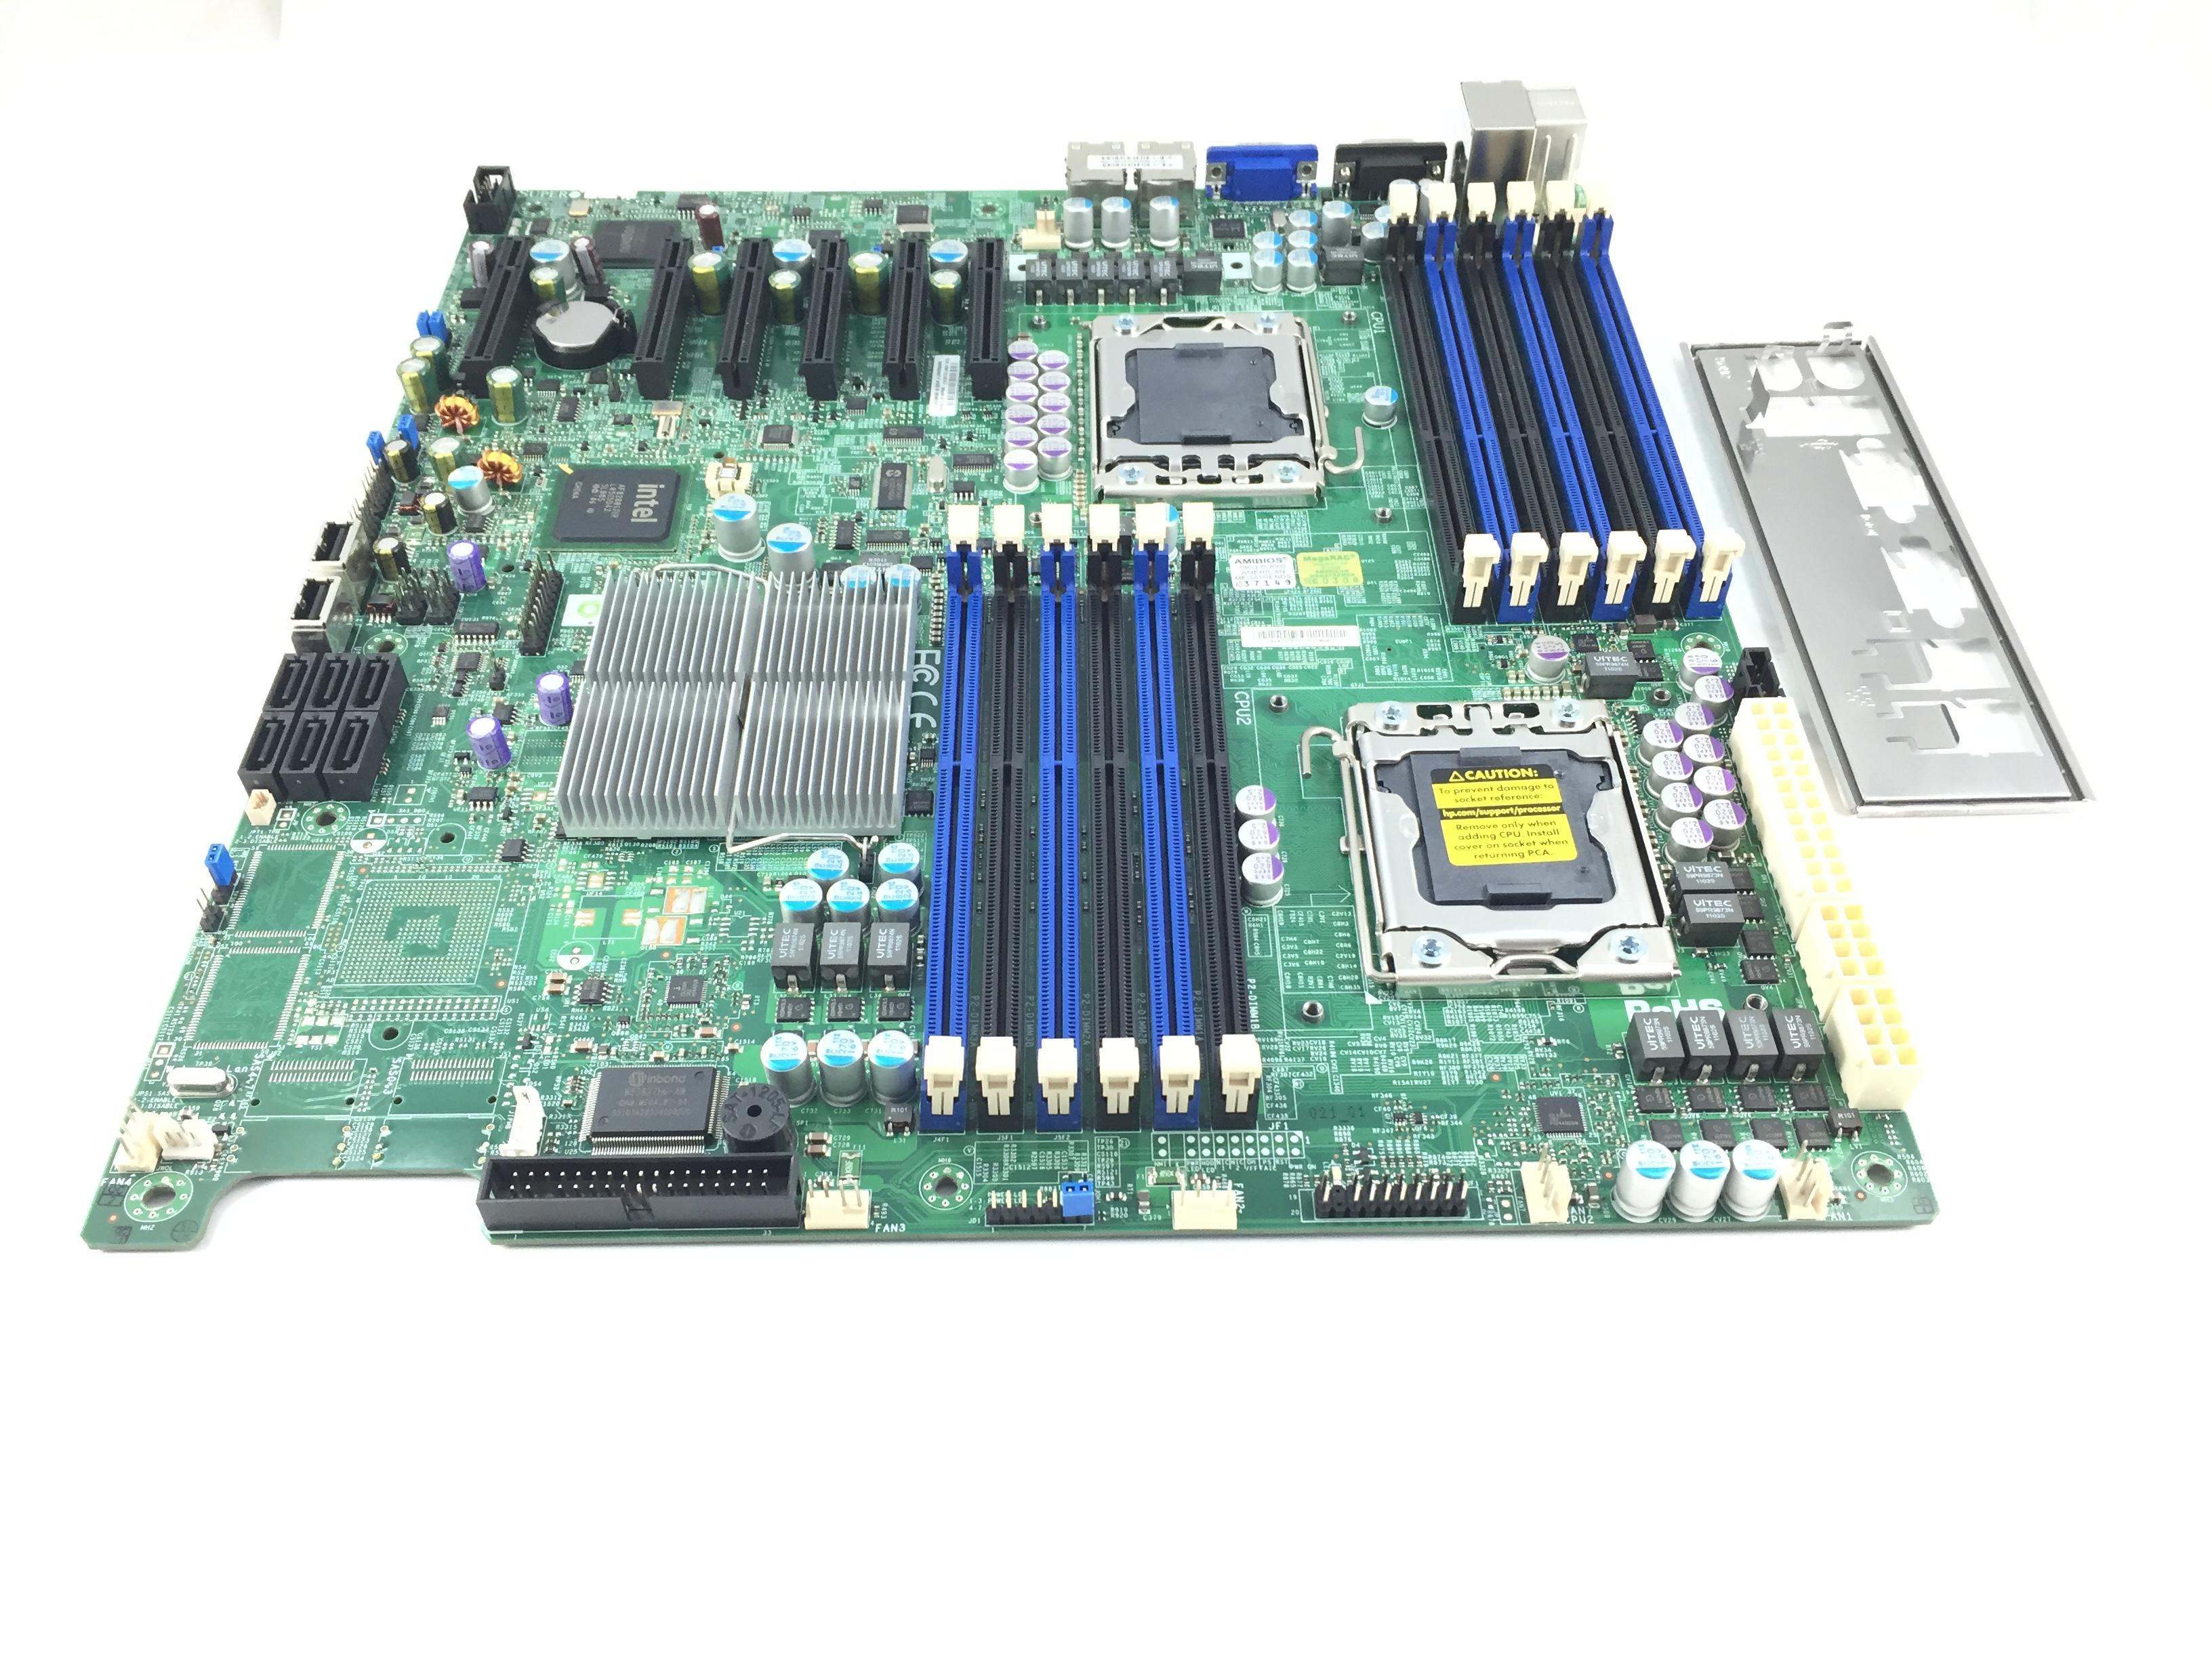 Supermicro Dual LGA1366 ATX Server System Board (X8DTE-F)